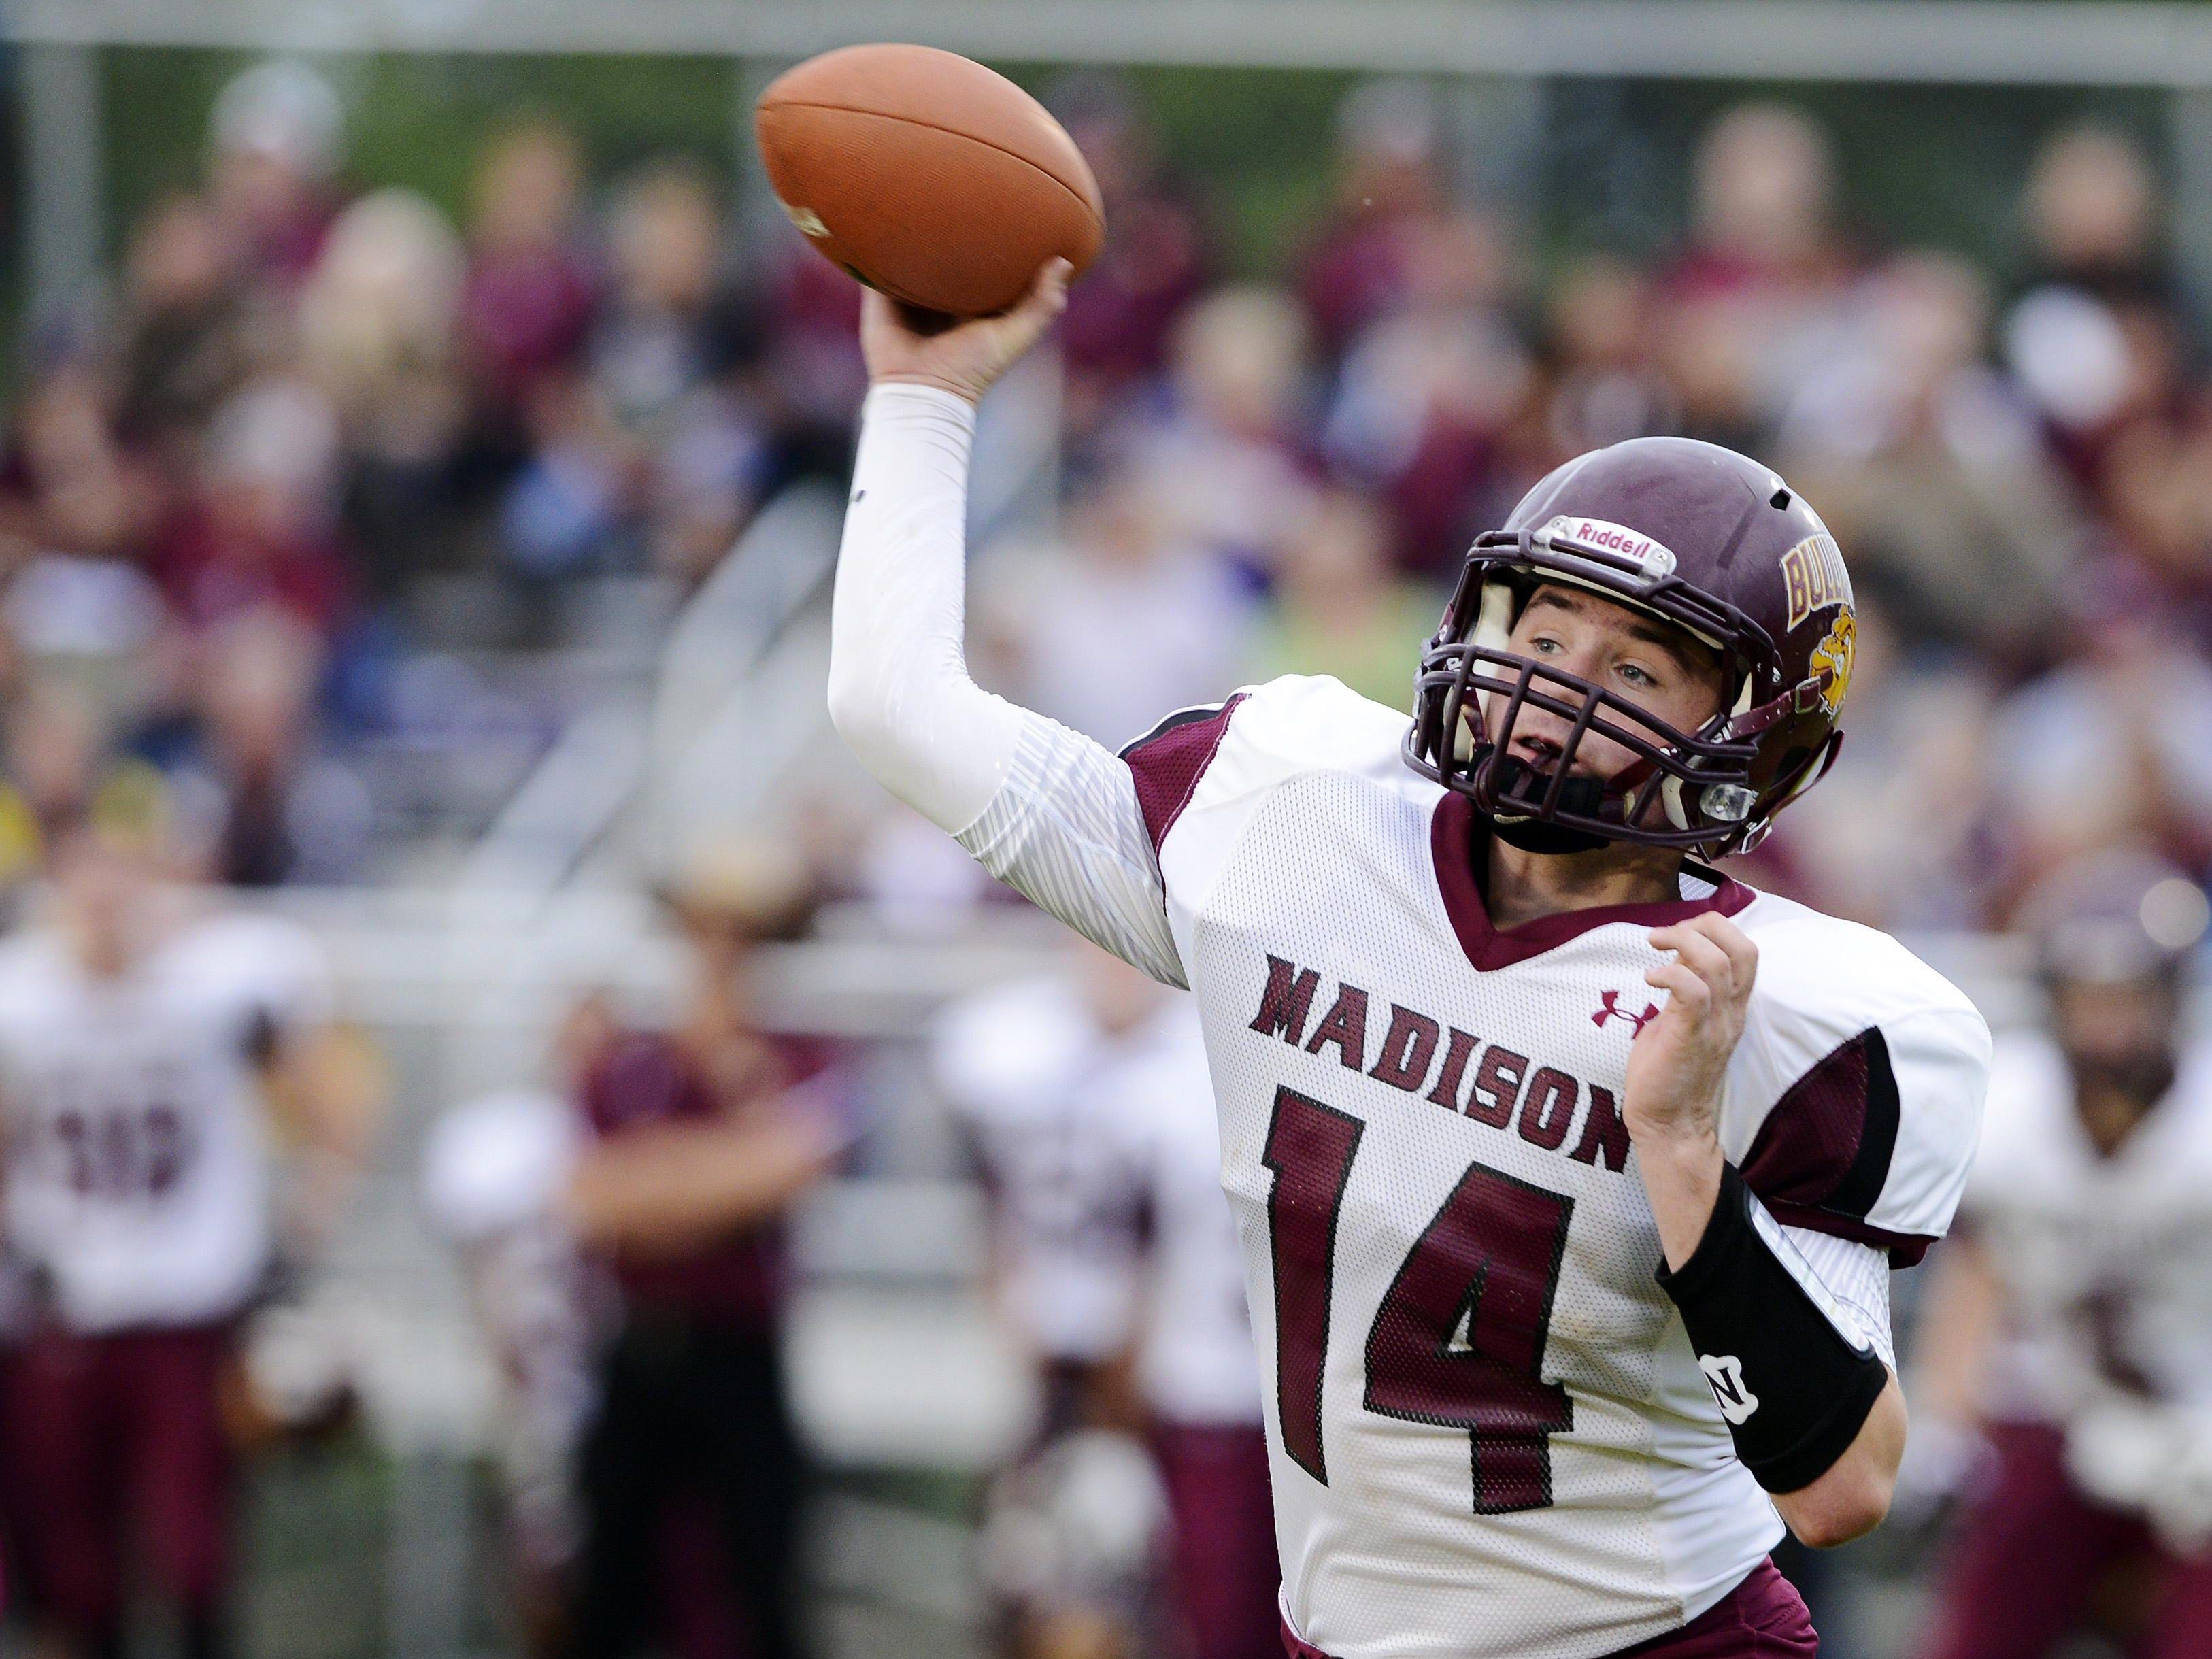 Madison quarterback Mitch Hansen is a player to watch this season.